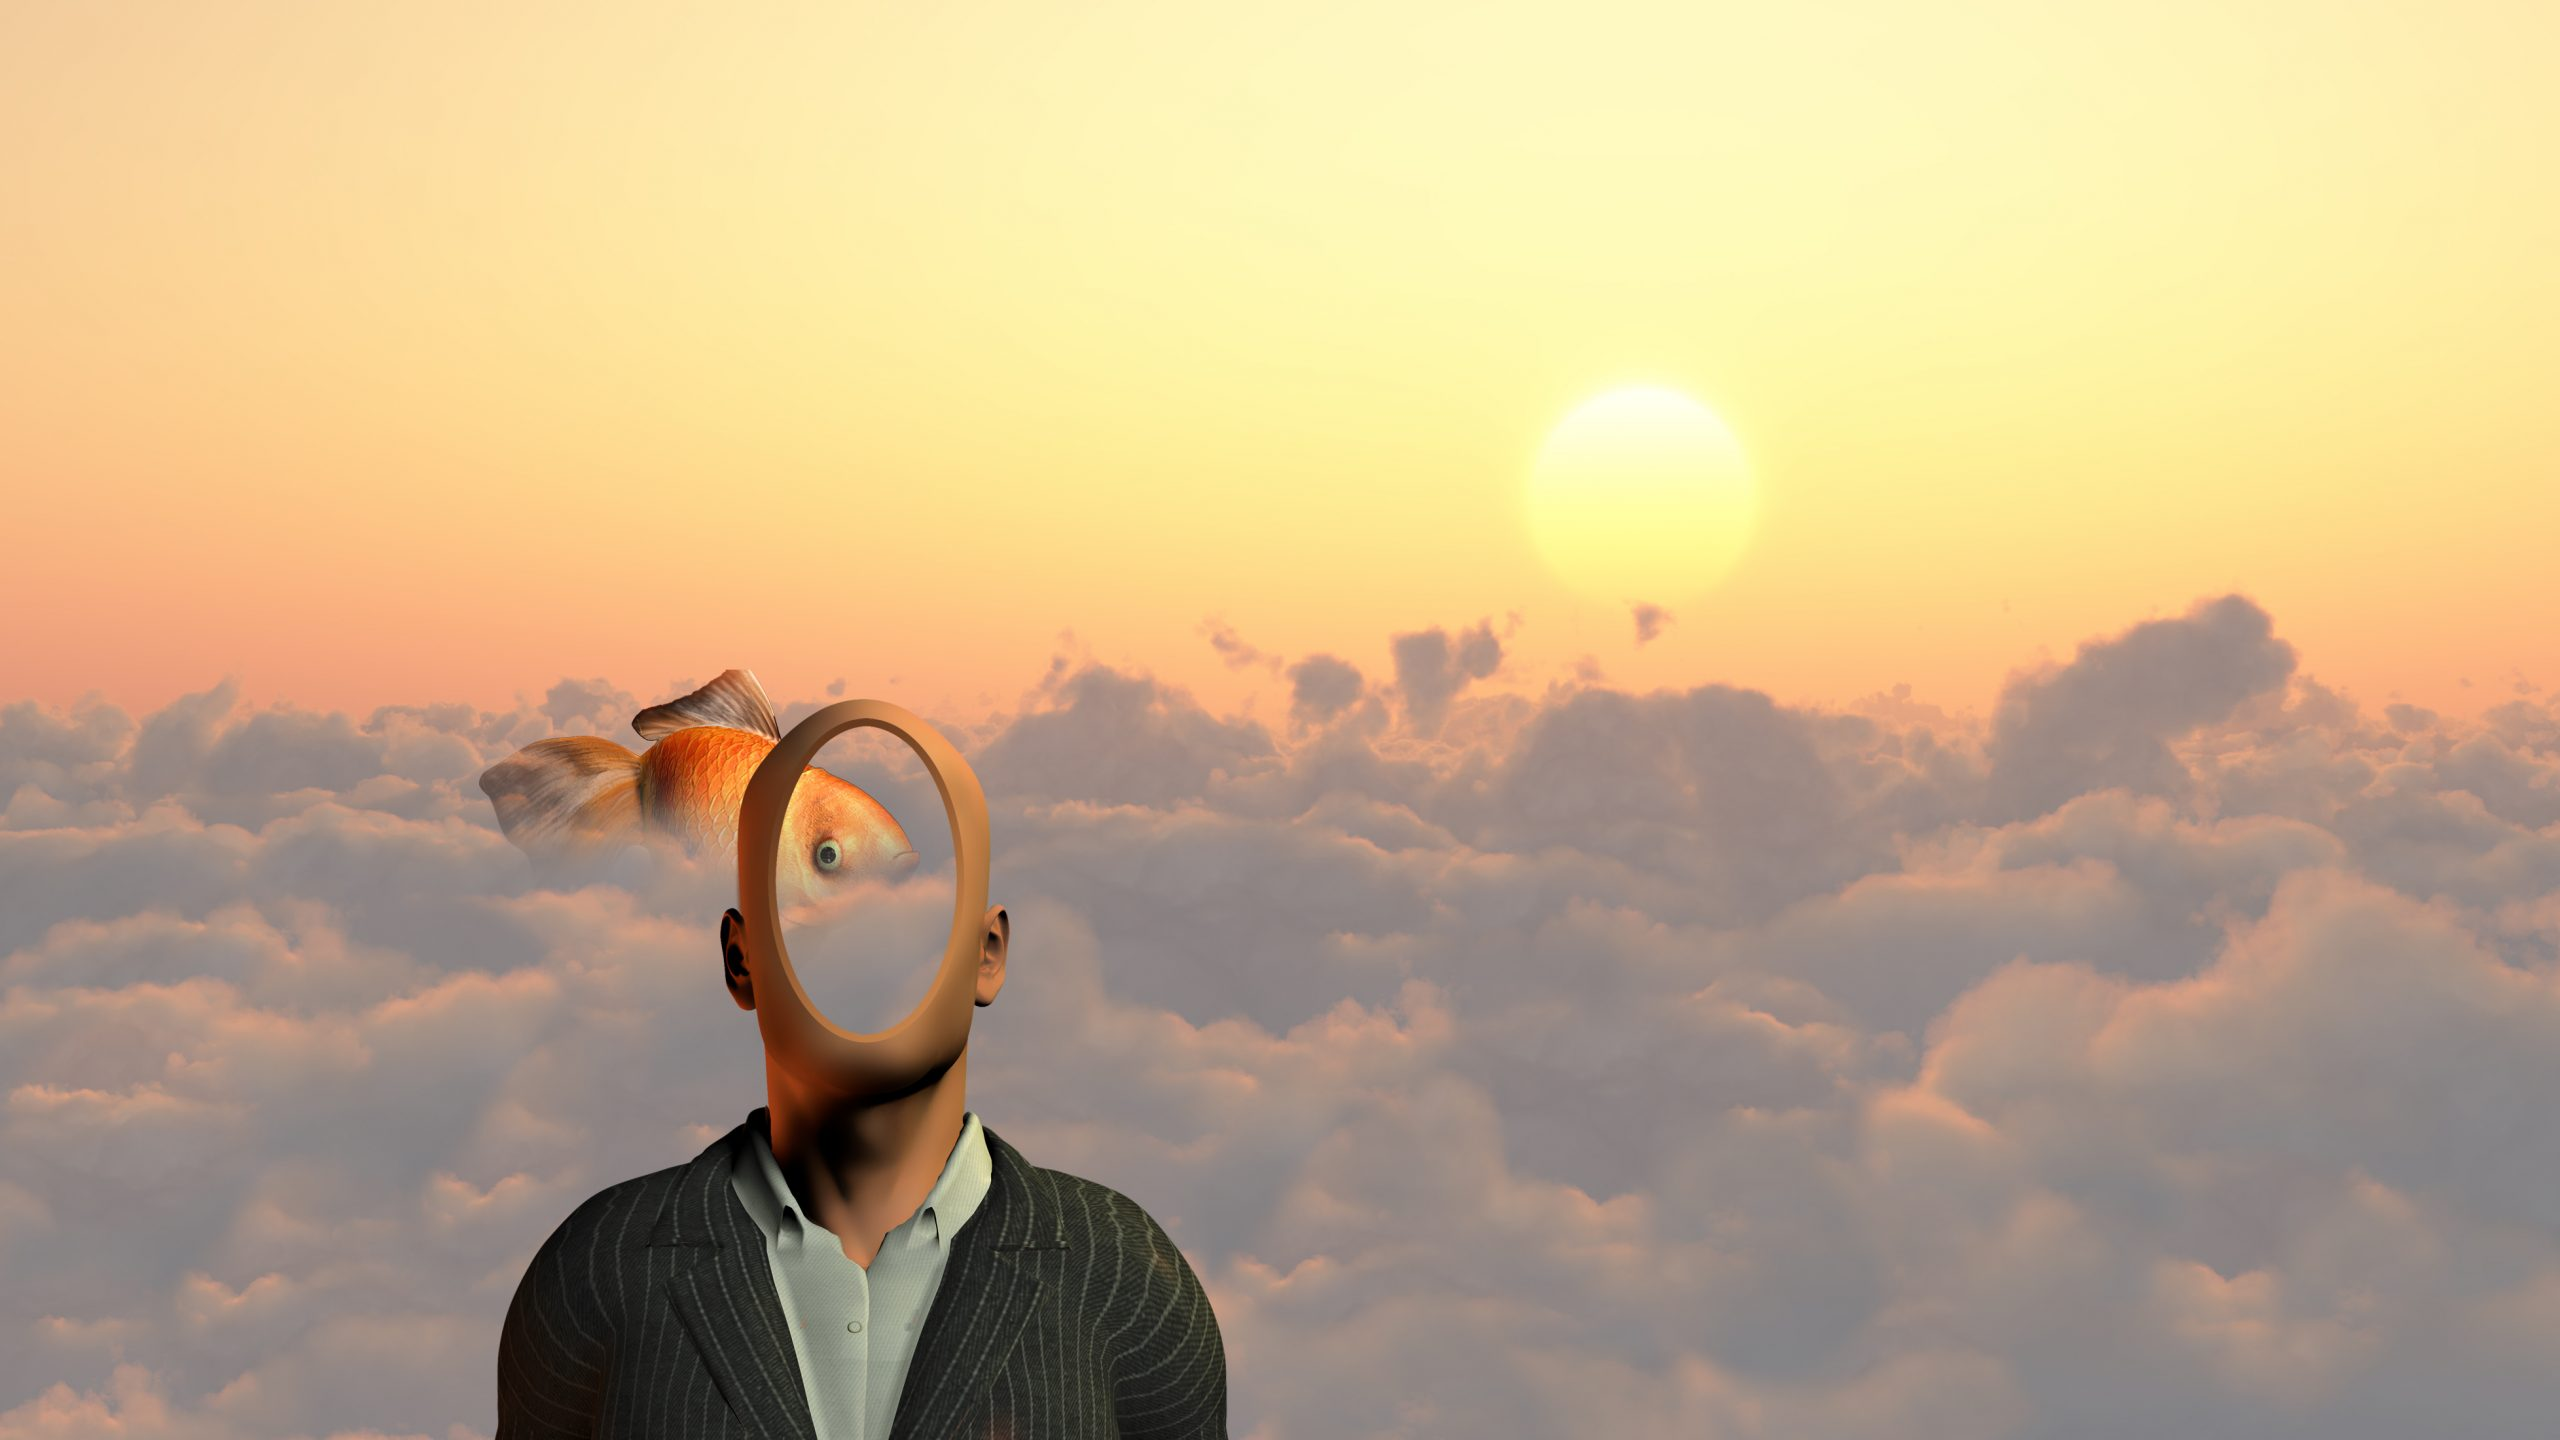 Faceless man above clouds. Golden fish